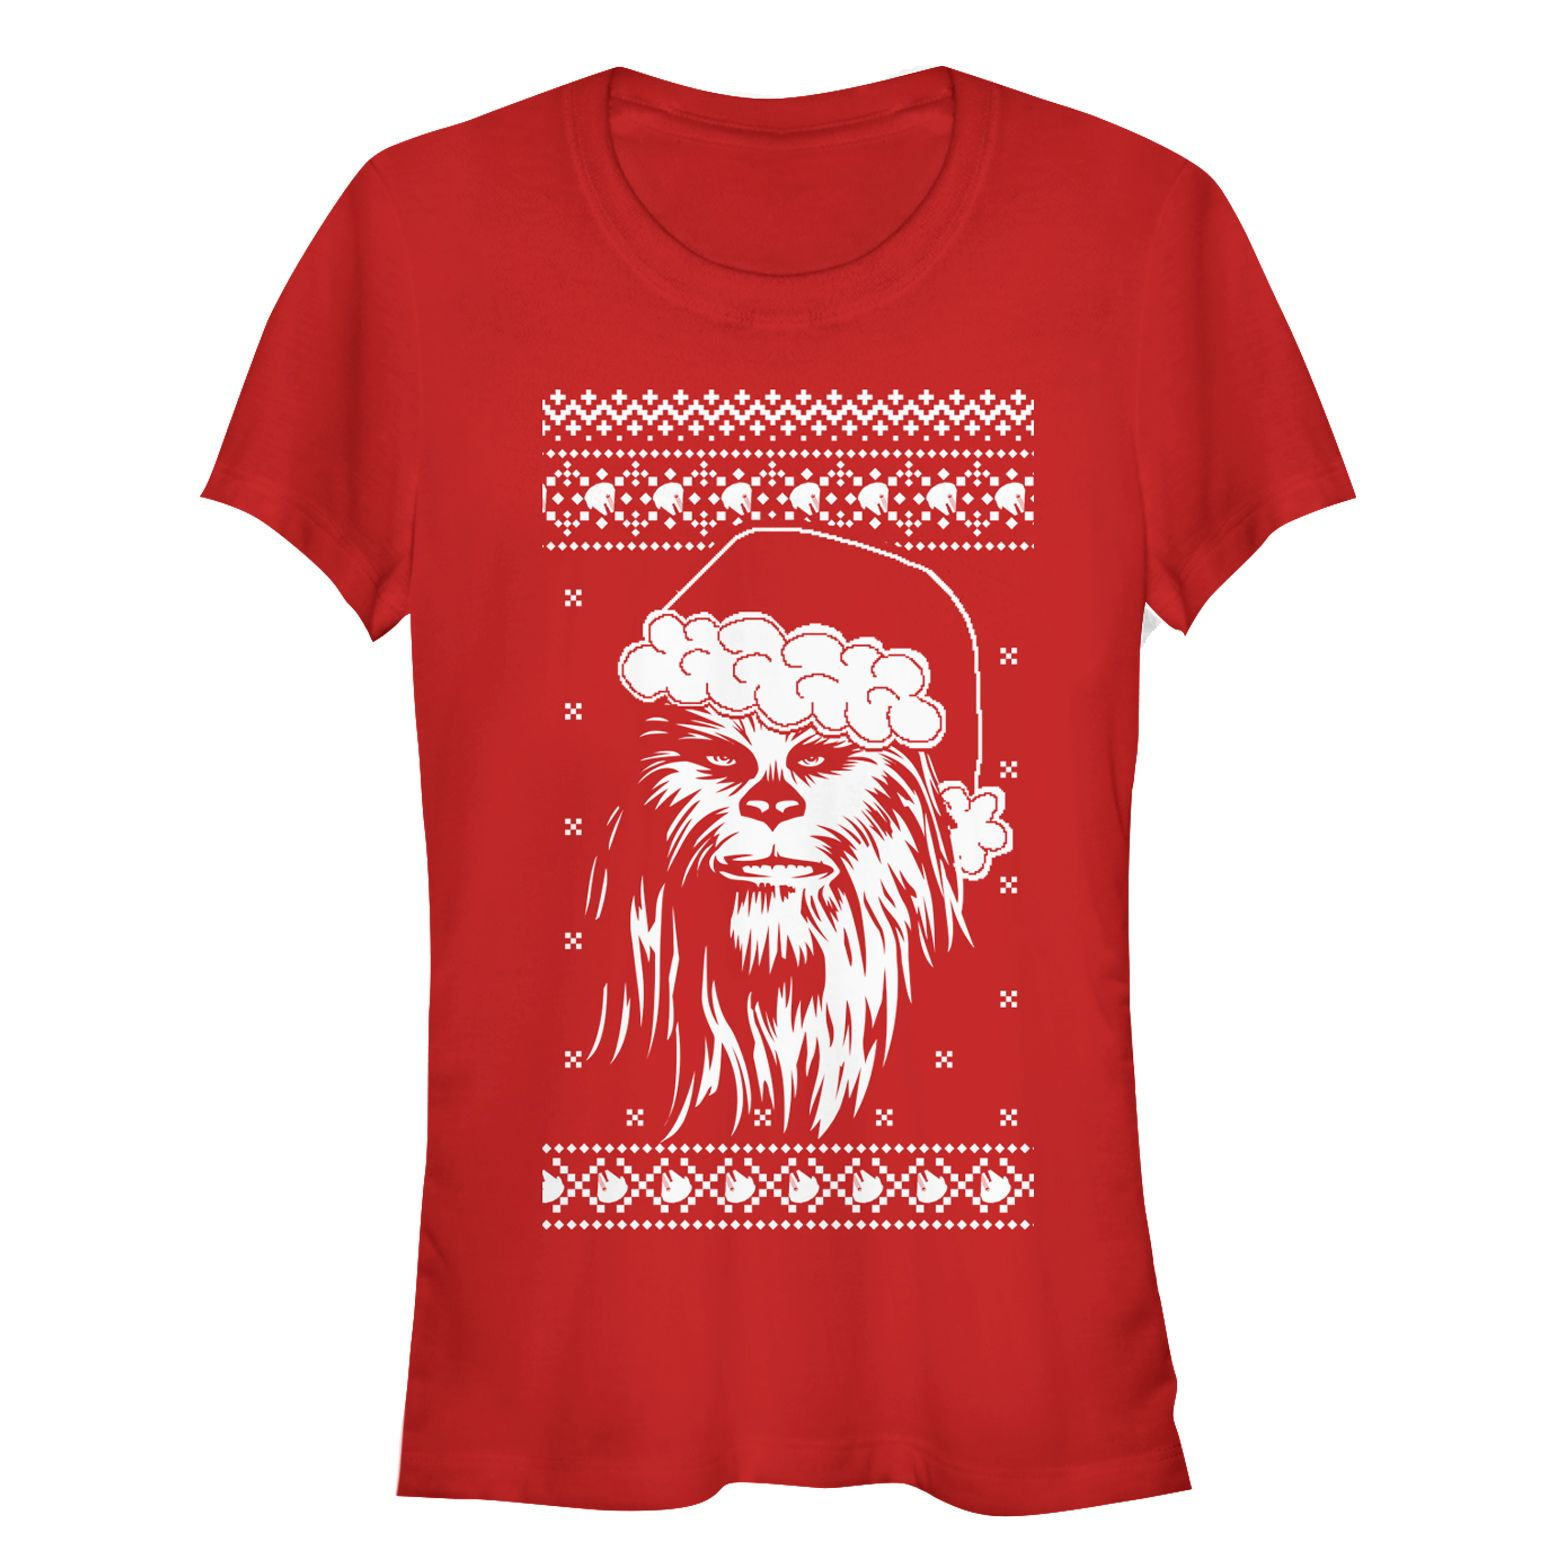 It/'s All Fun /& Games Juniors Black Christmas Sweatshirt: